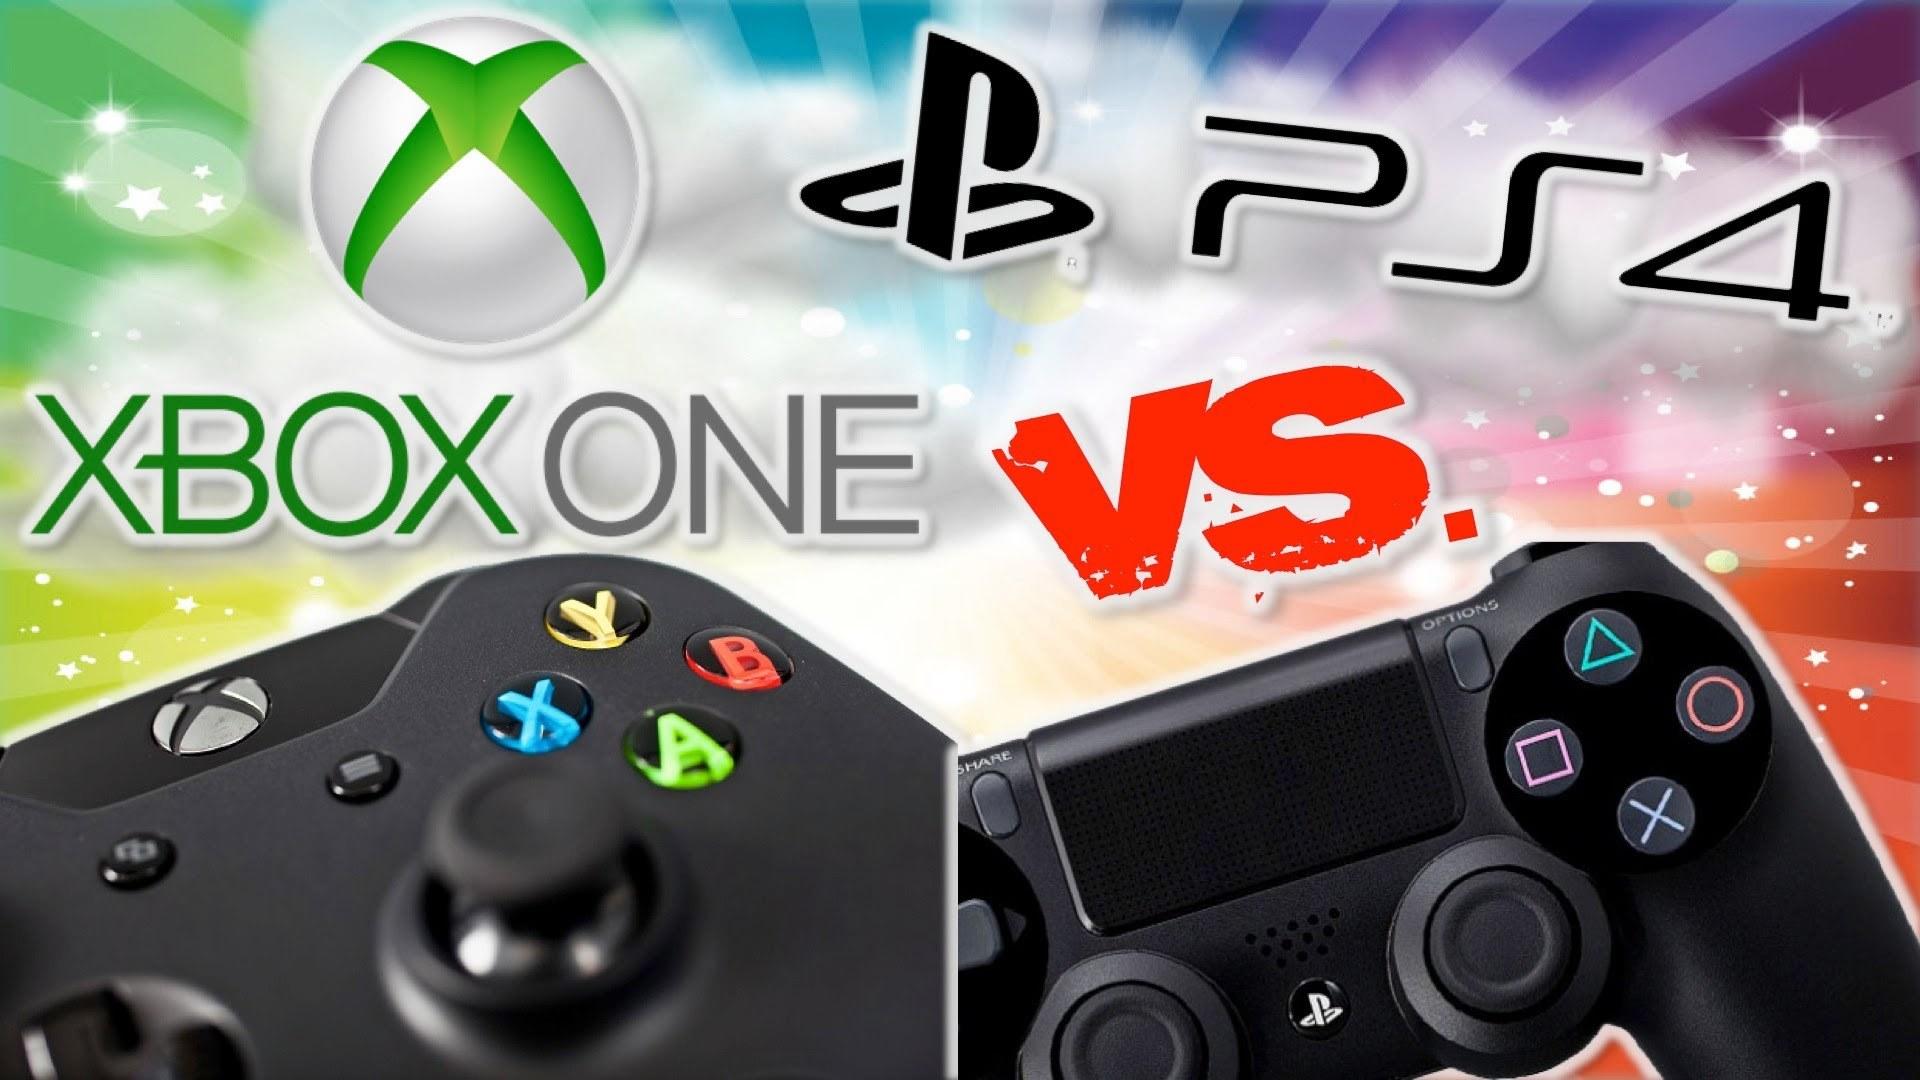 Xbox One Wallpaper 1080p 142 1080p Ps4 vs Xbox One 1 1920x1080